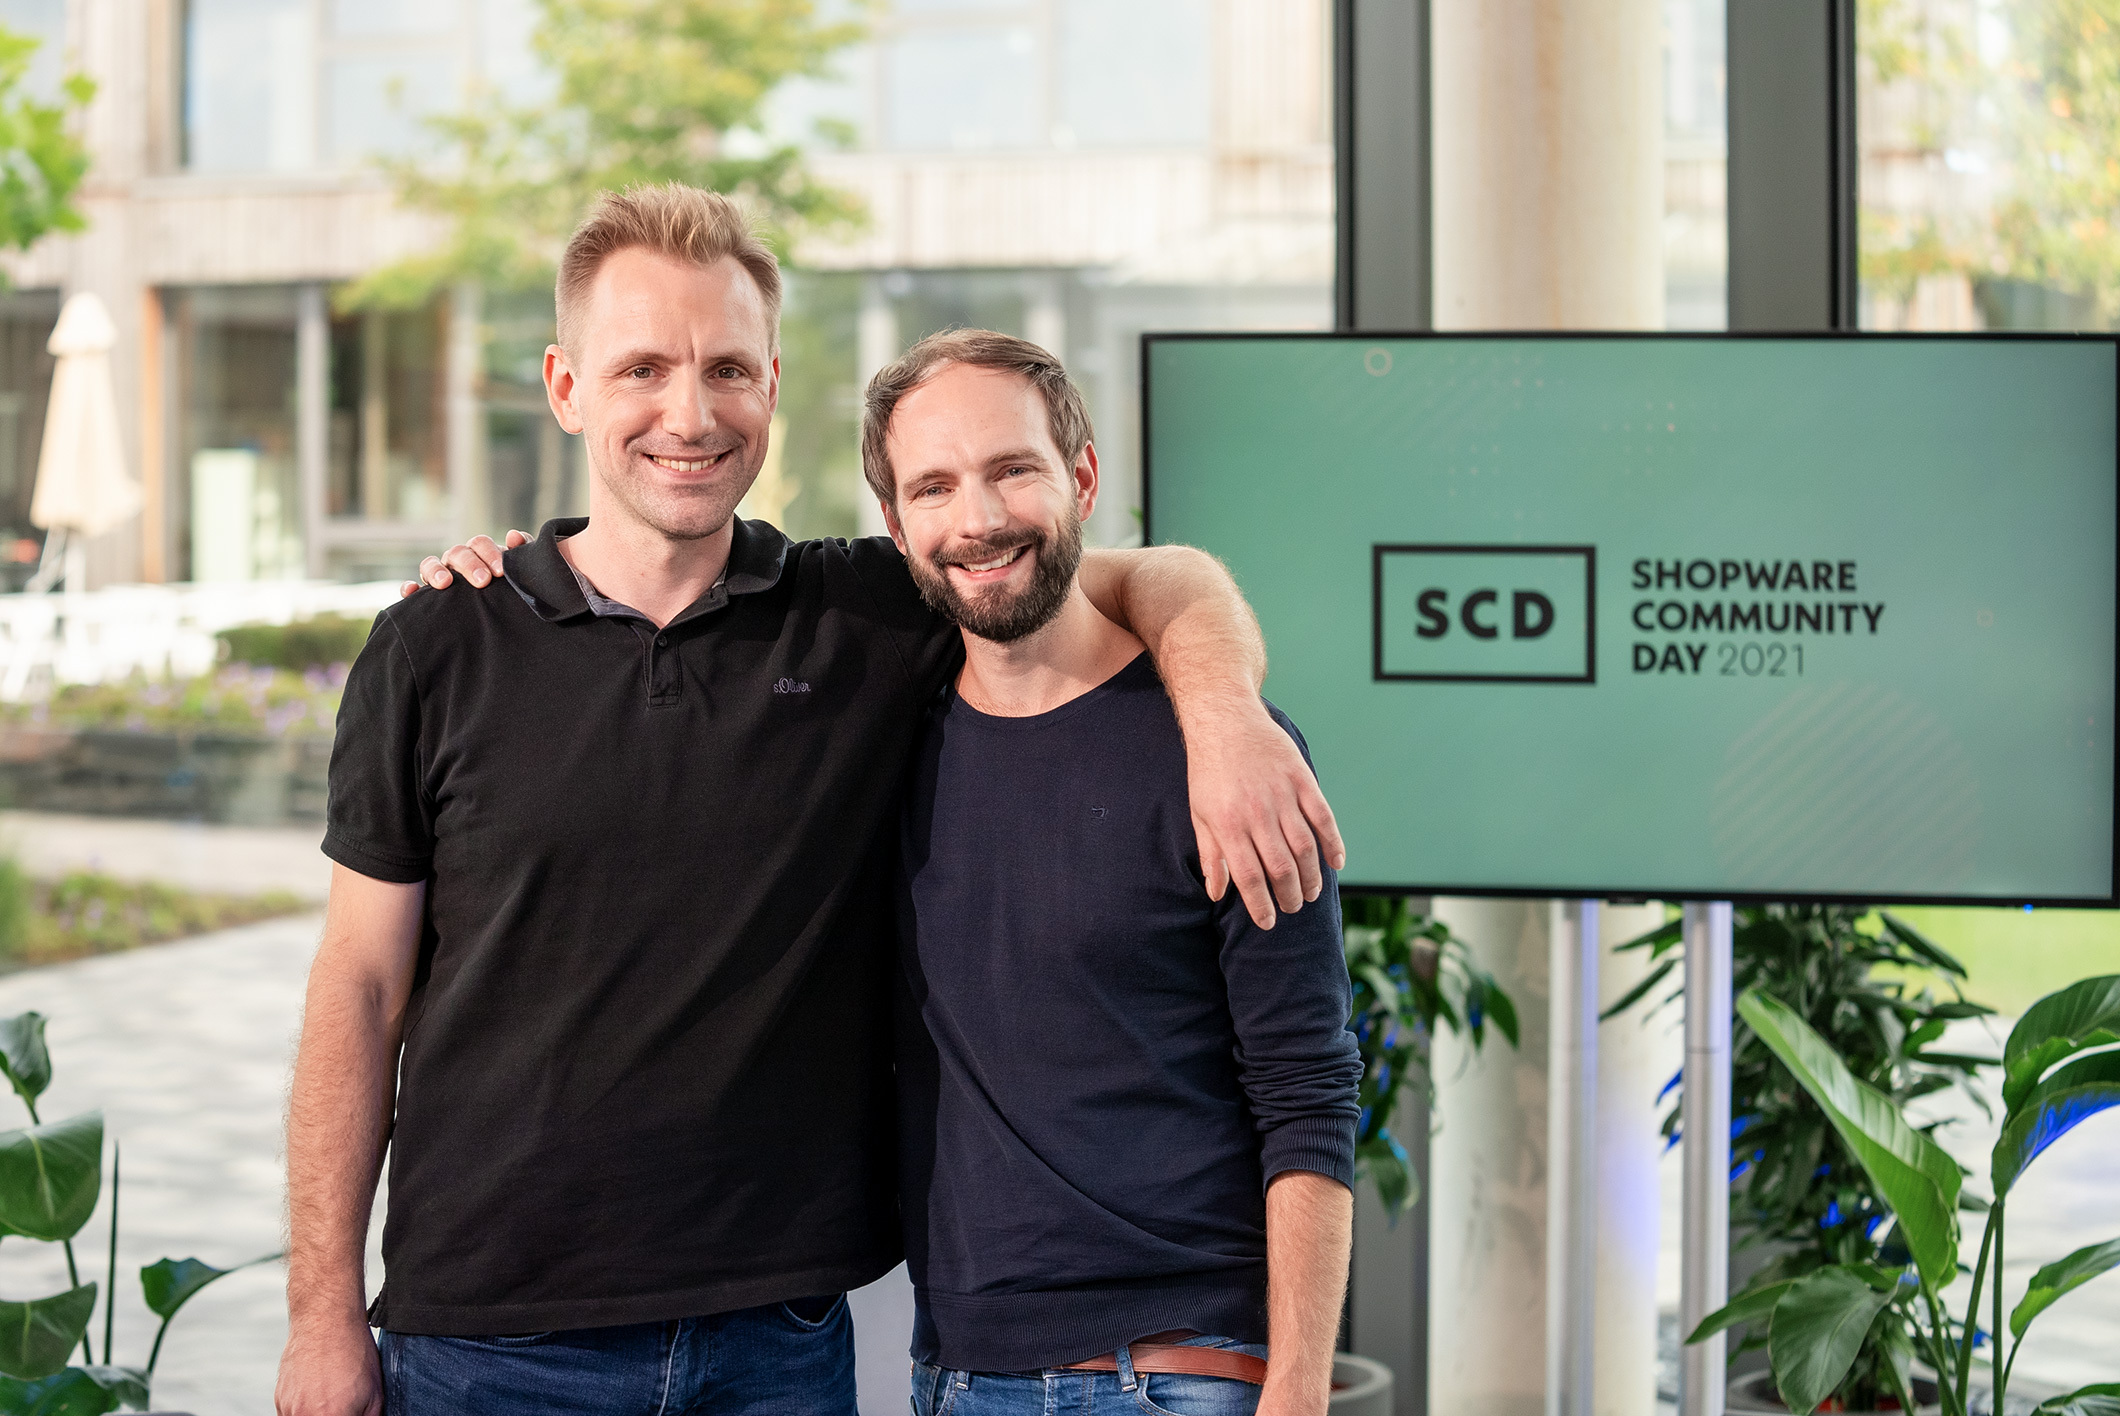 shopware community day 2021 stefan und sebastian hamann im scd studio